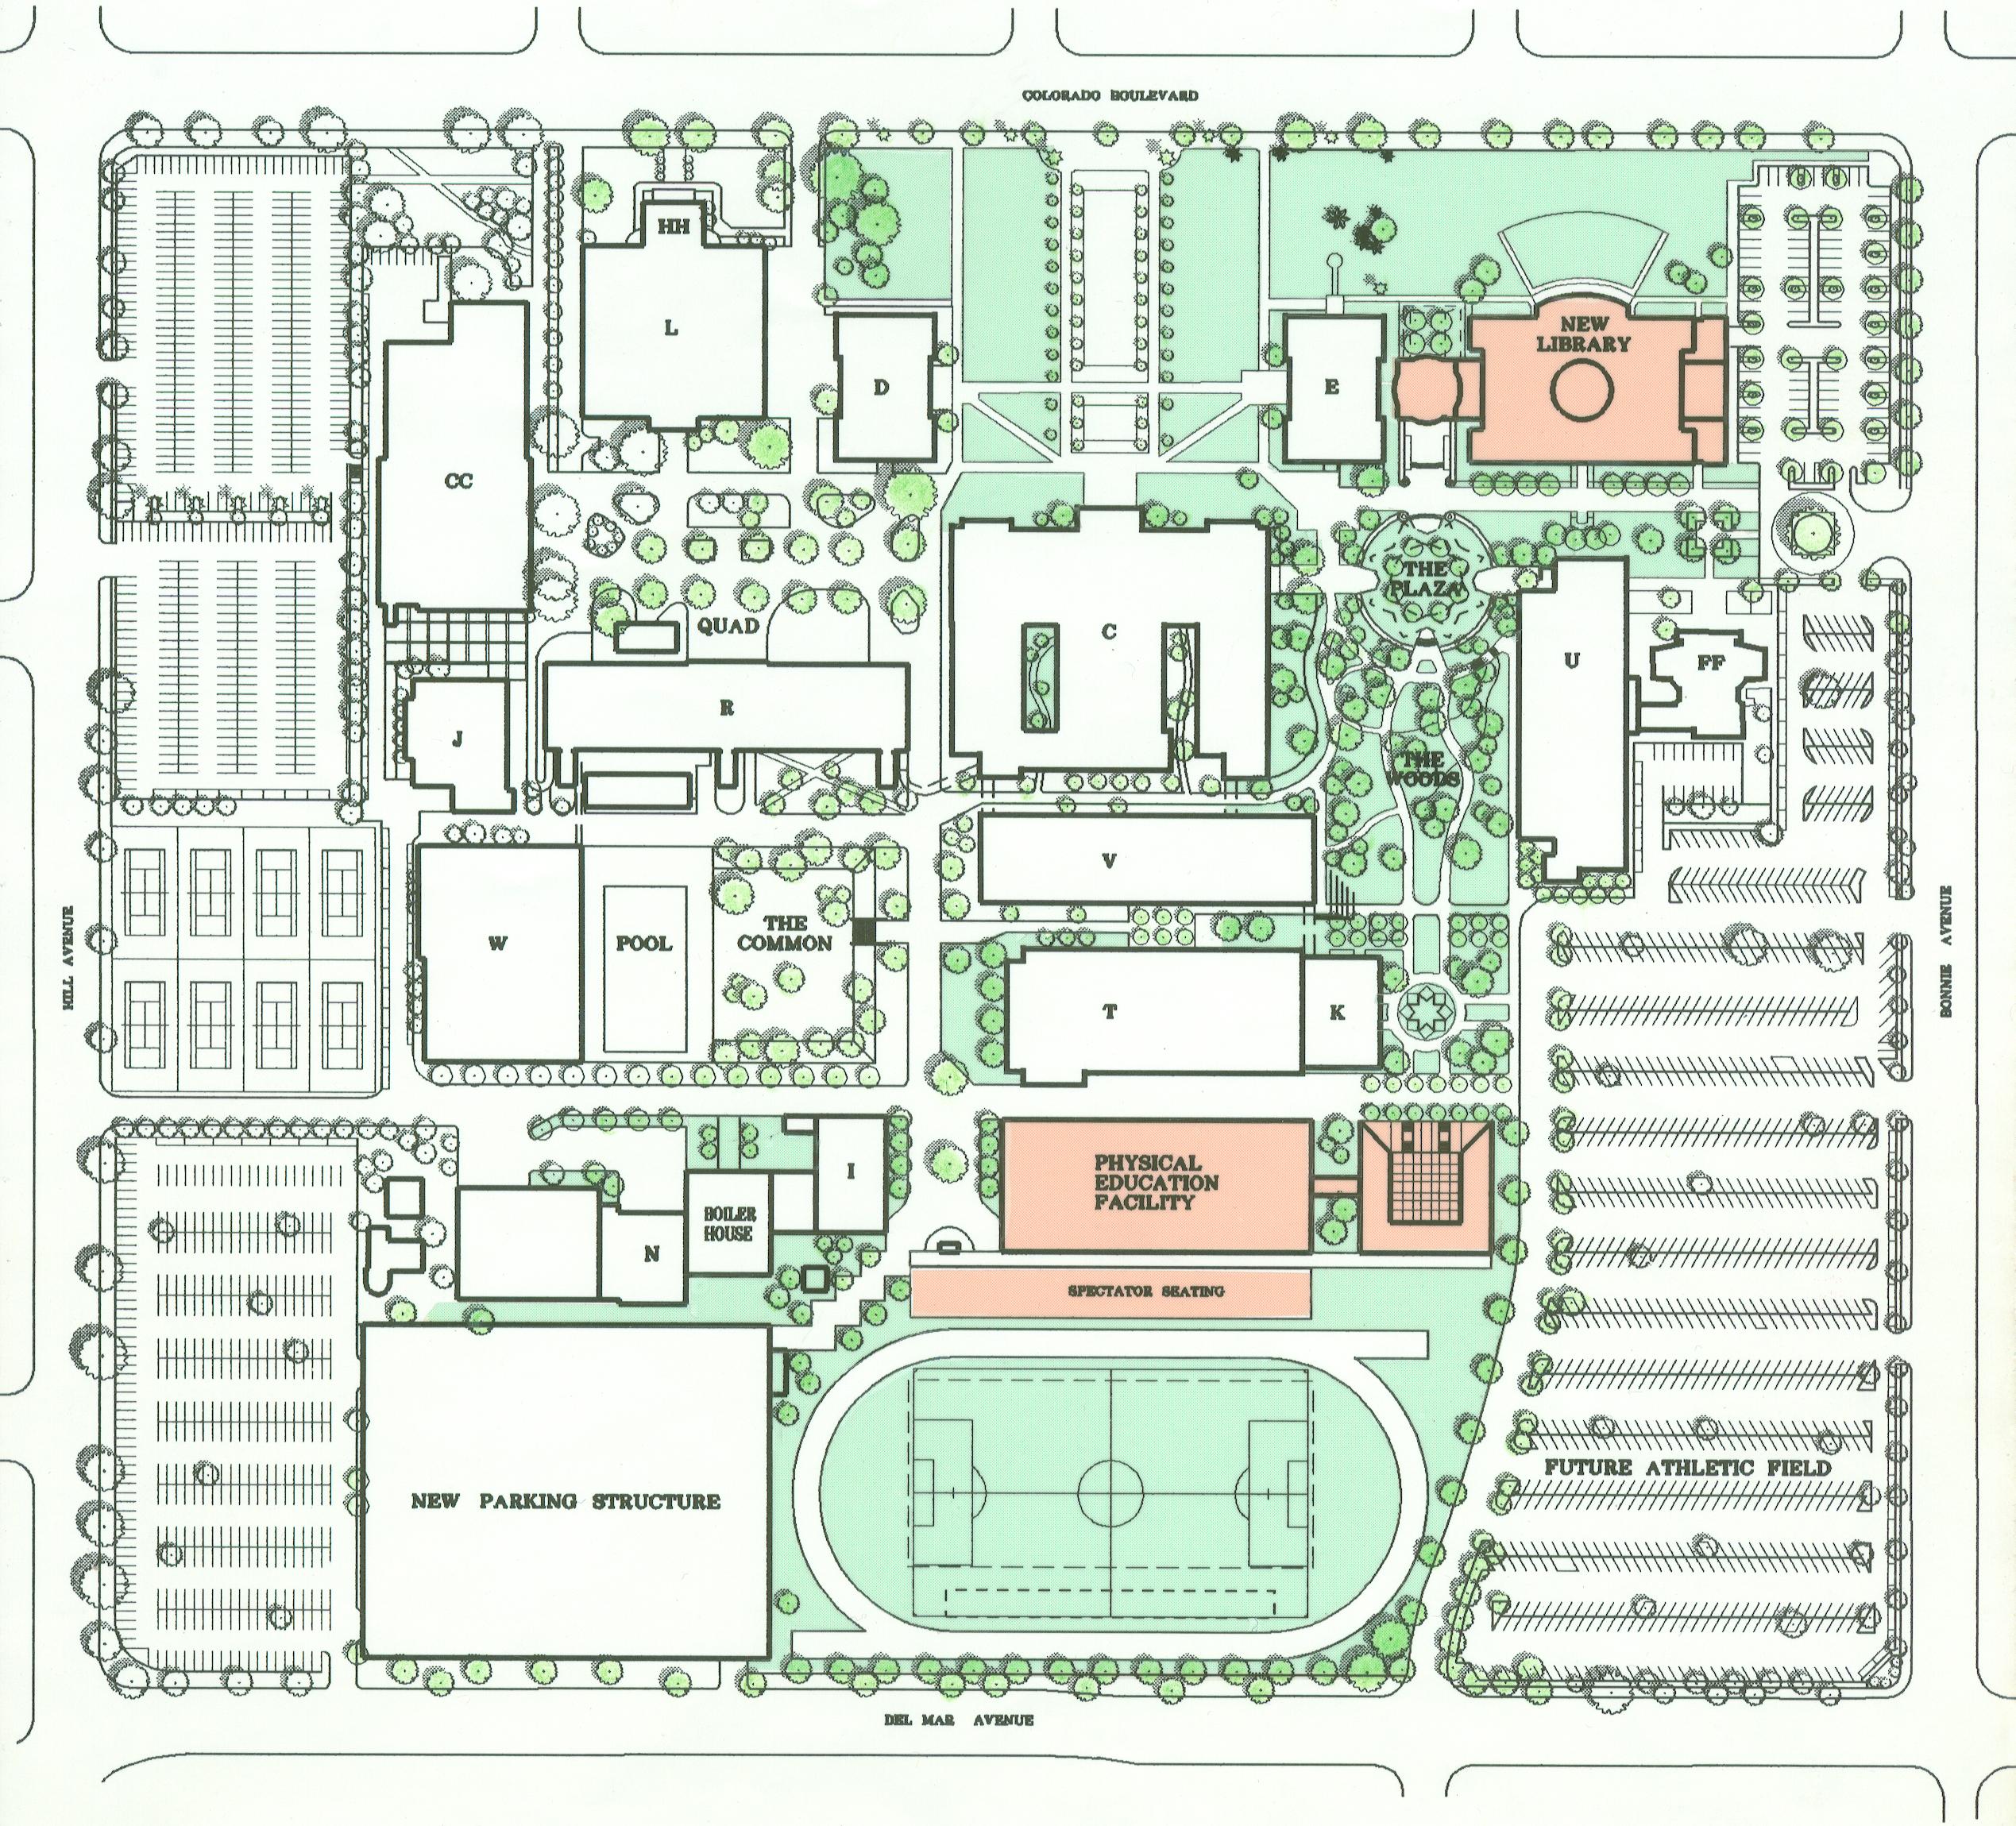 Pasadena City College Master Plan 01